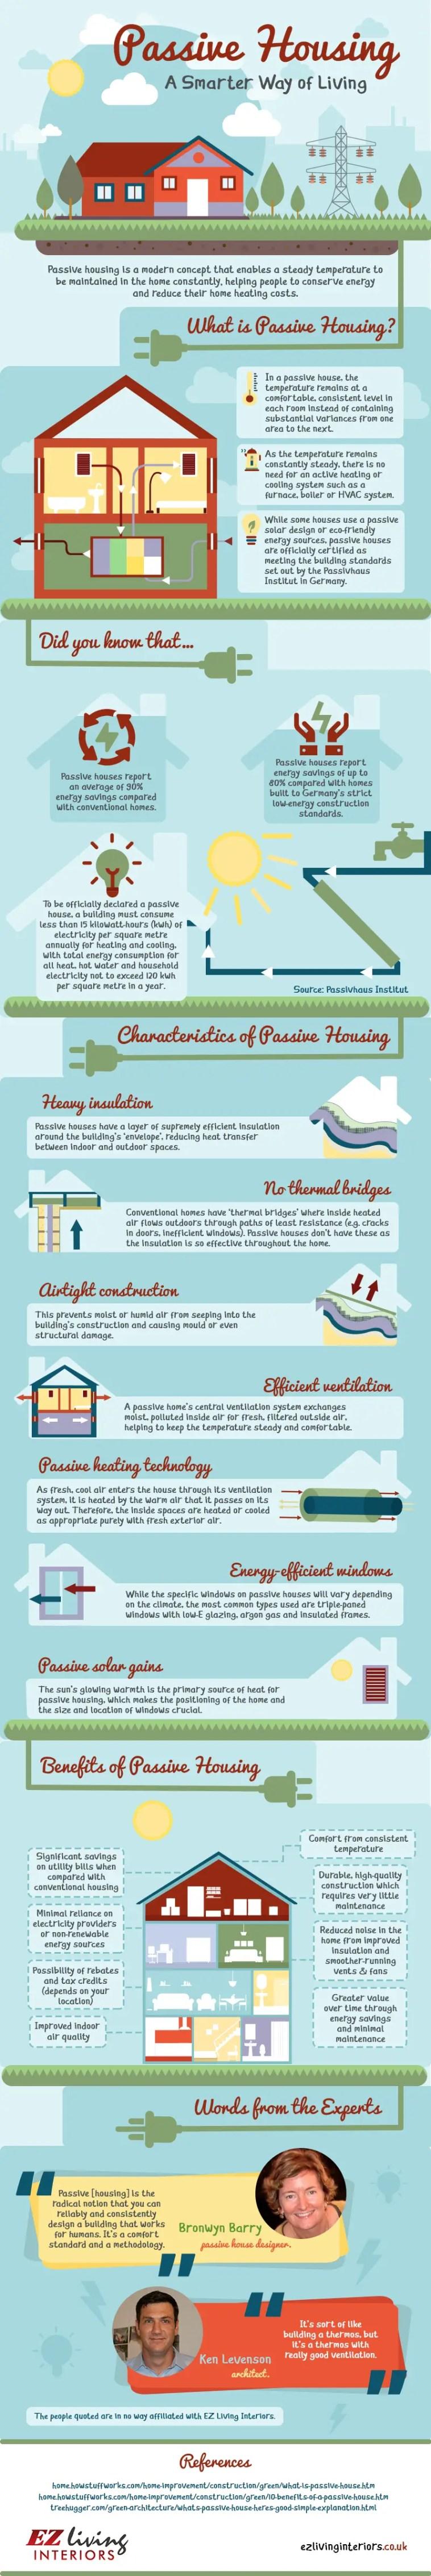 passive-housing-a-smarter-way-of-living